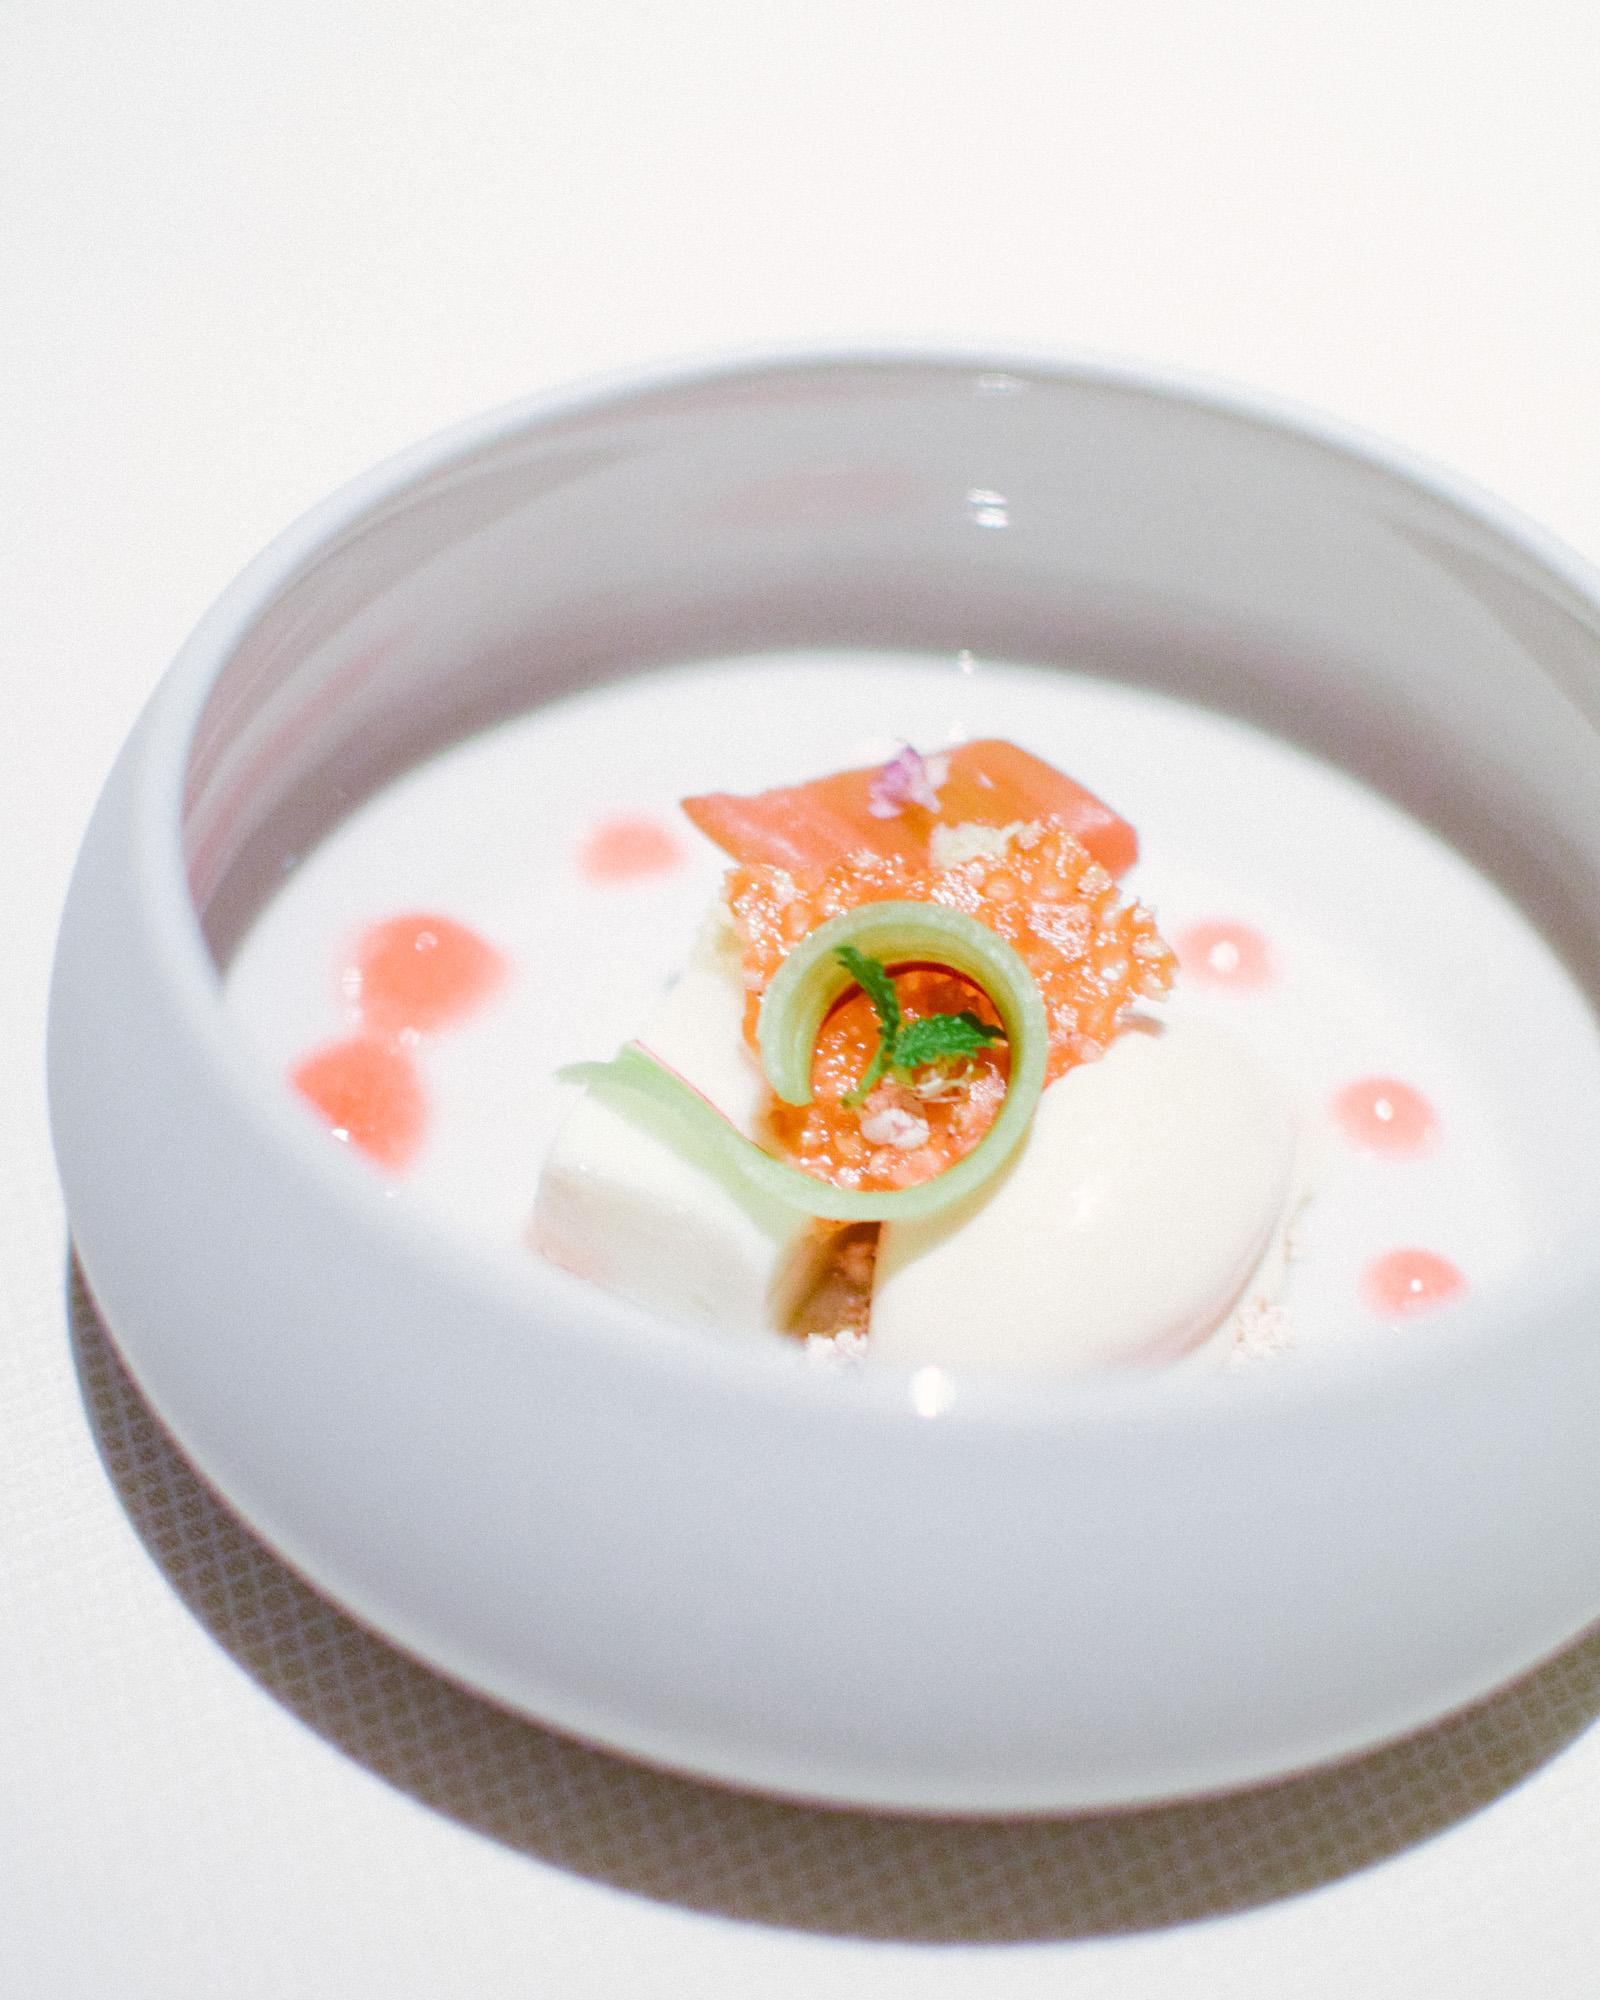 Thirteenth Course: Poached Rhubarb, Goat's Milk, Sesame